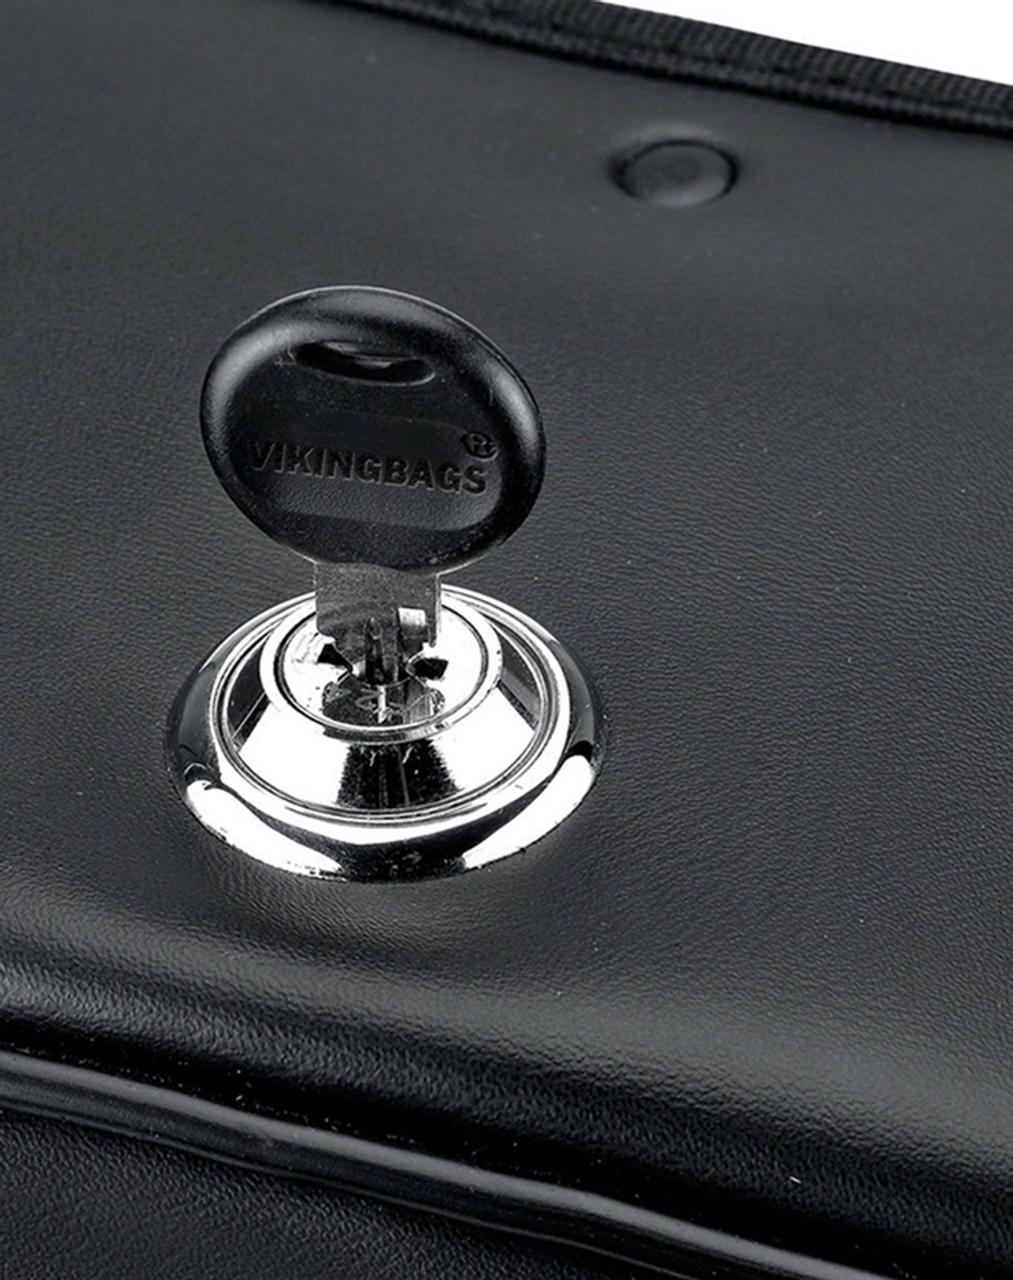 Triumph Thunderbird Warrior Series Motorcycle Saddlebags Key Lock View